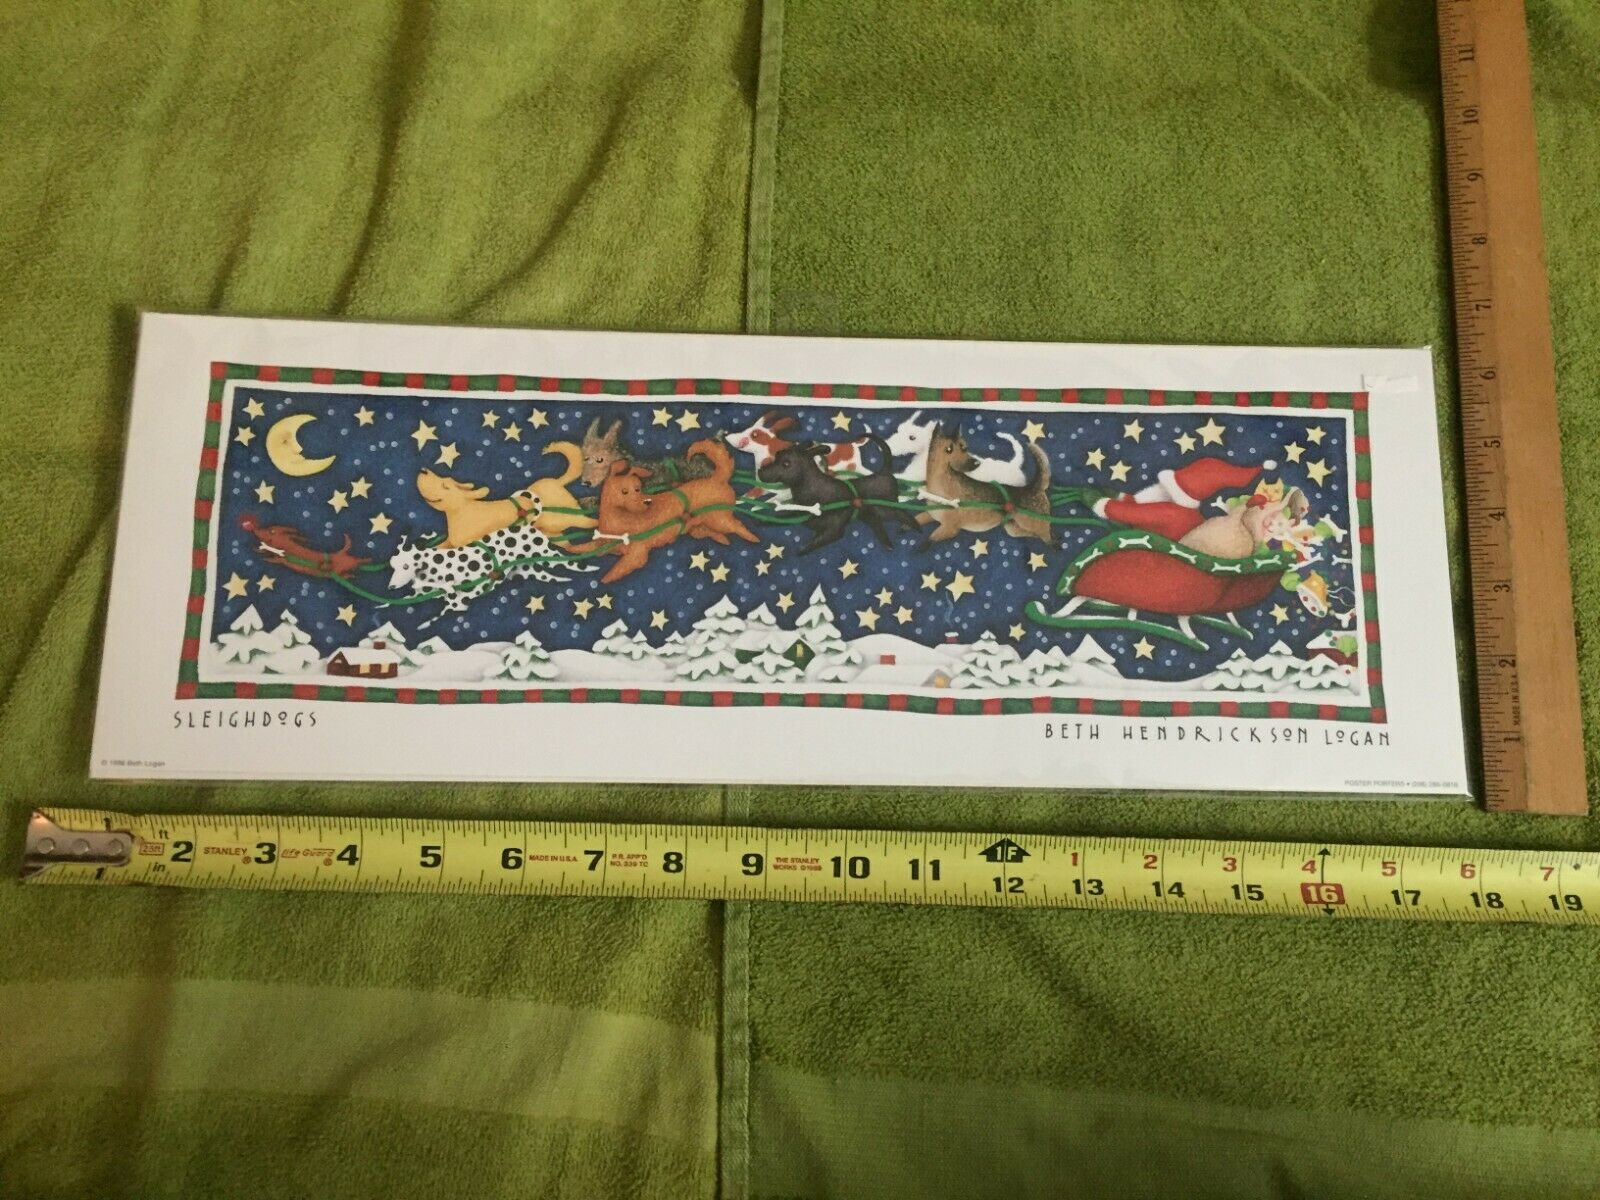 Sleighdogs Christmas/Holiday Print Santa Pulled Dogs Frame Beth Hendrikson Logan - $31.99